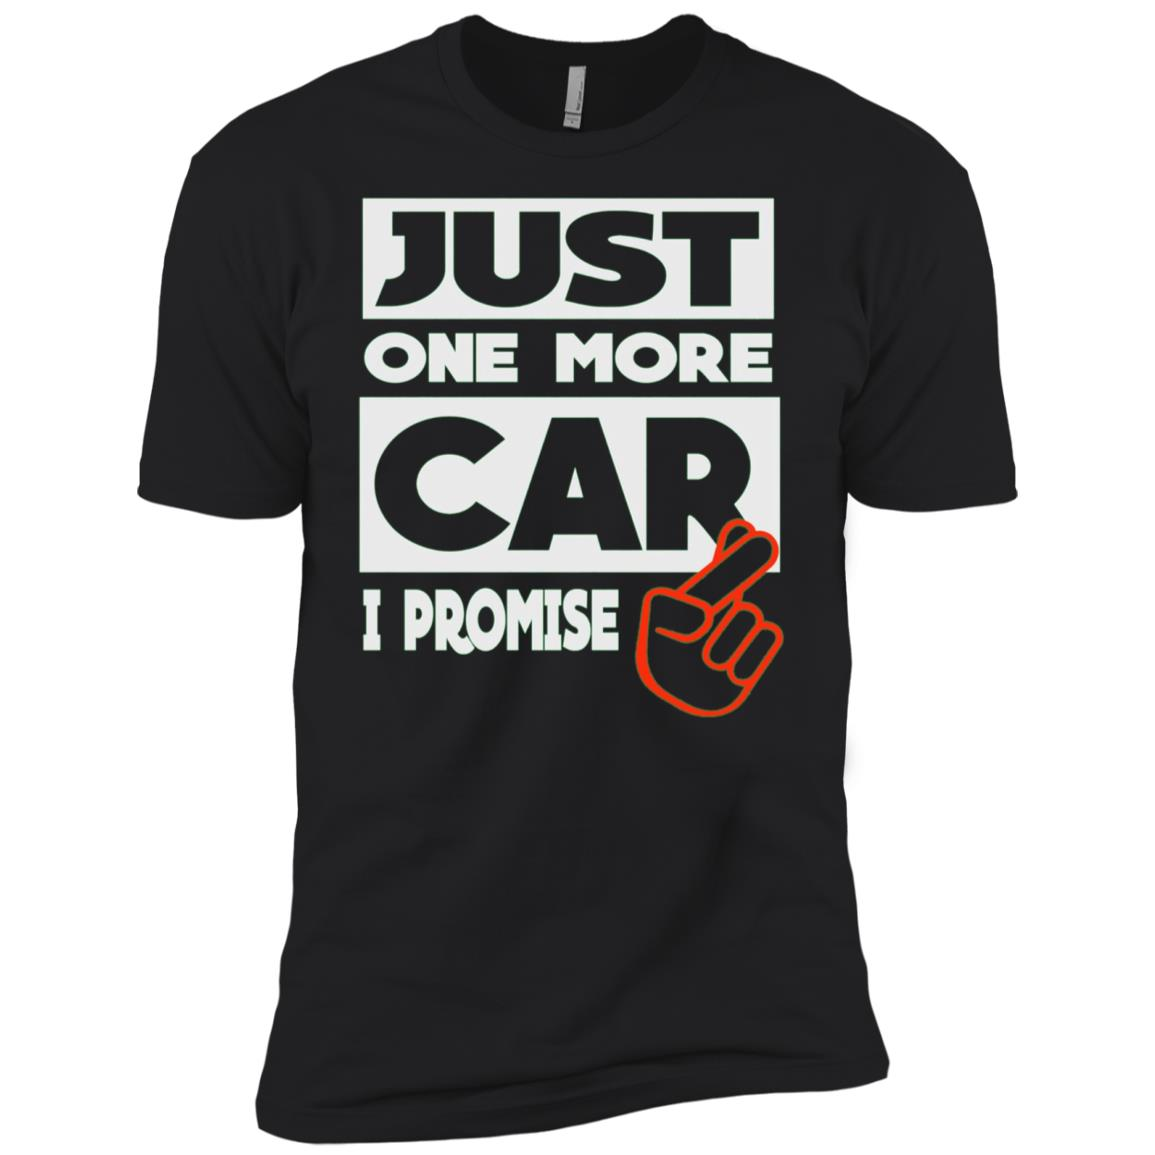 Just One More Car – I Promise Men Short Sleeve T-Shirt